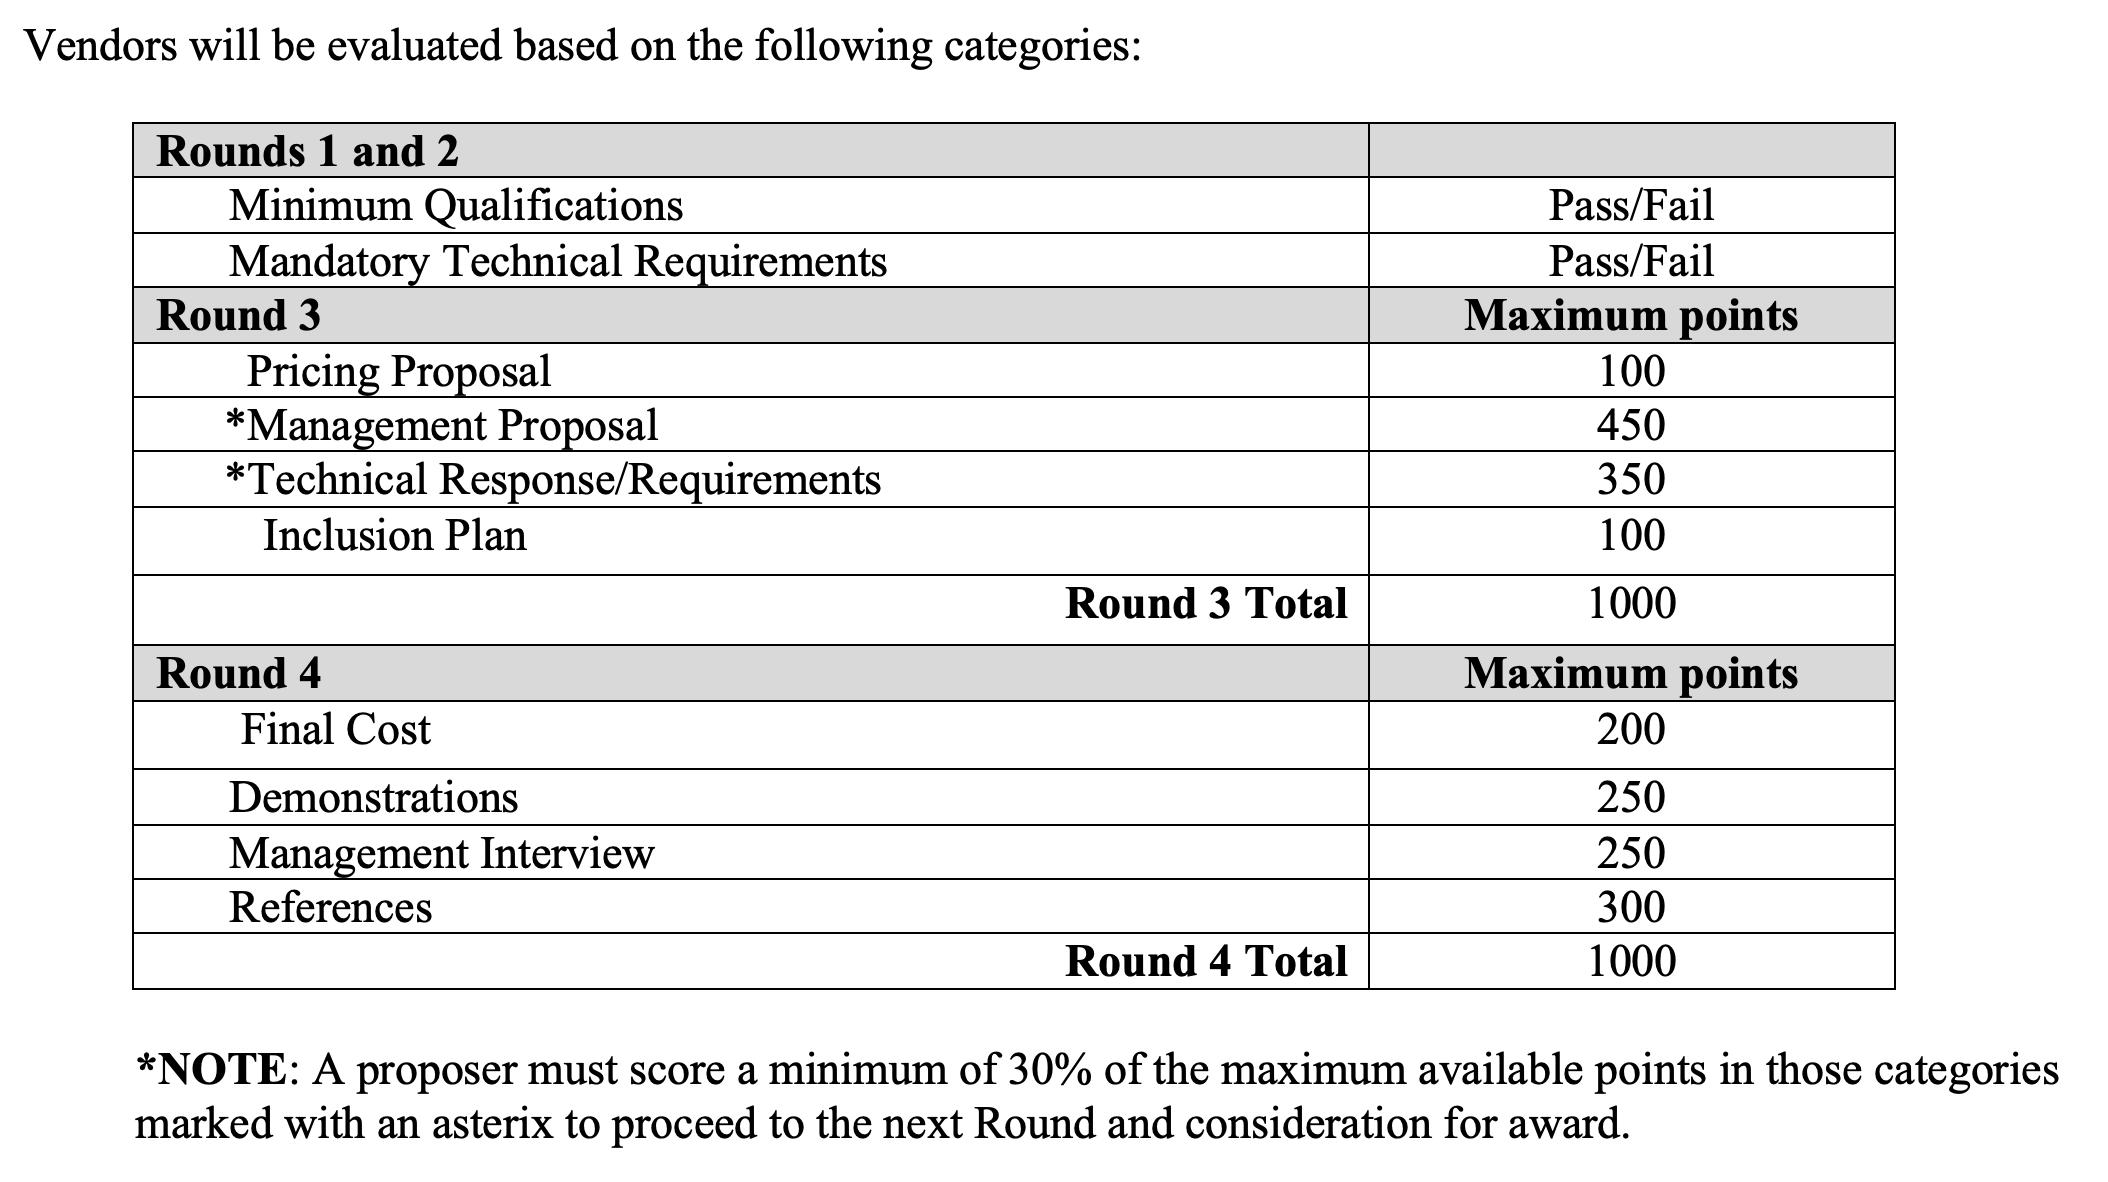 Analytics RFP evaluation criteria example